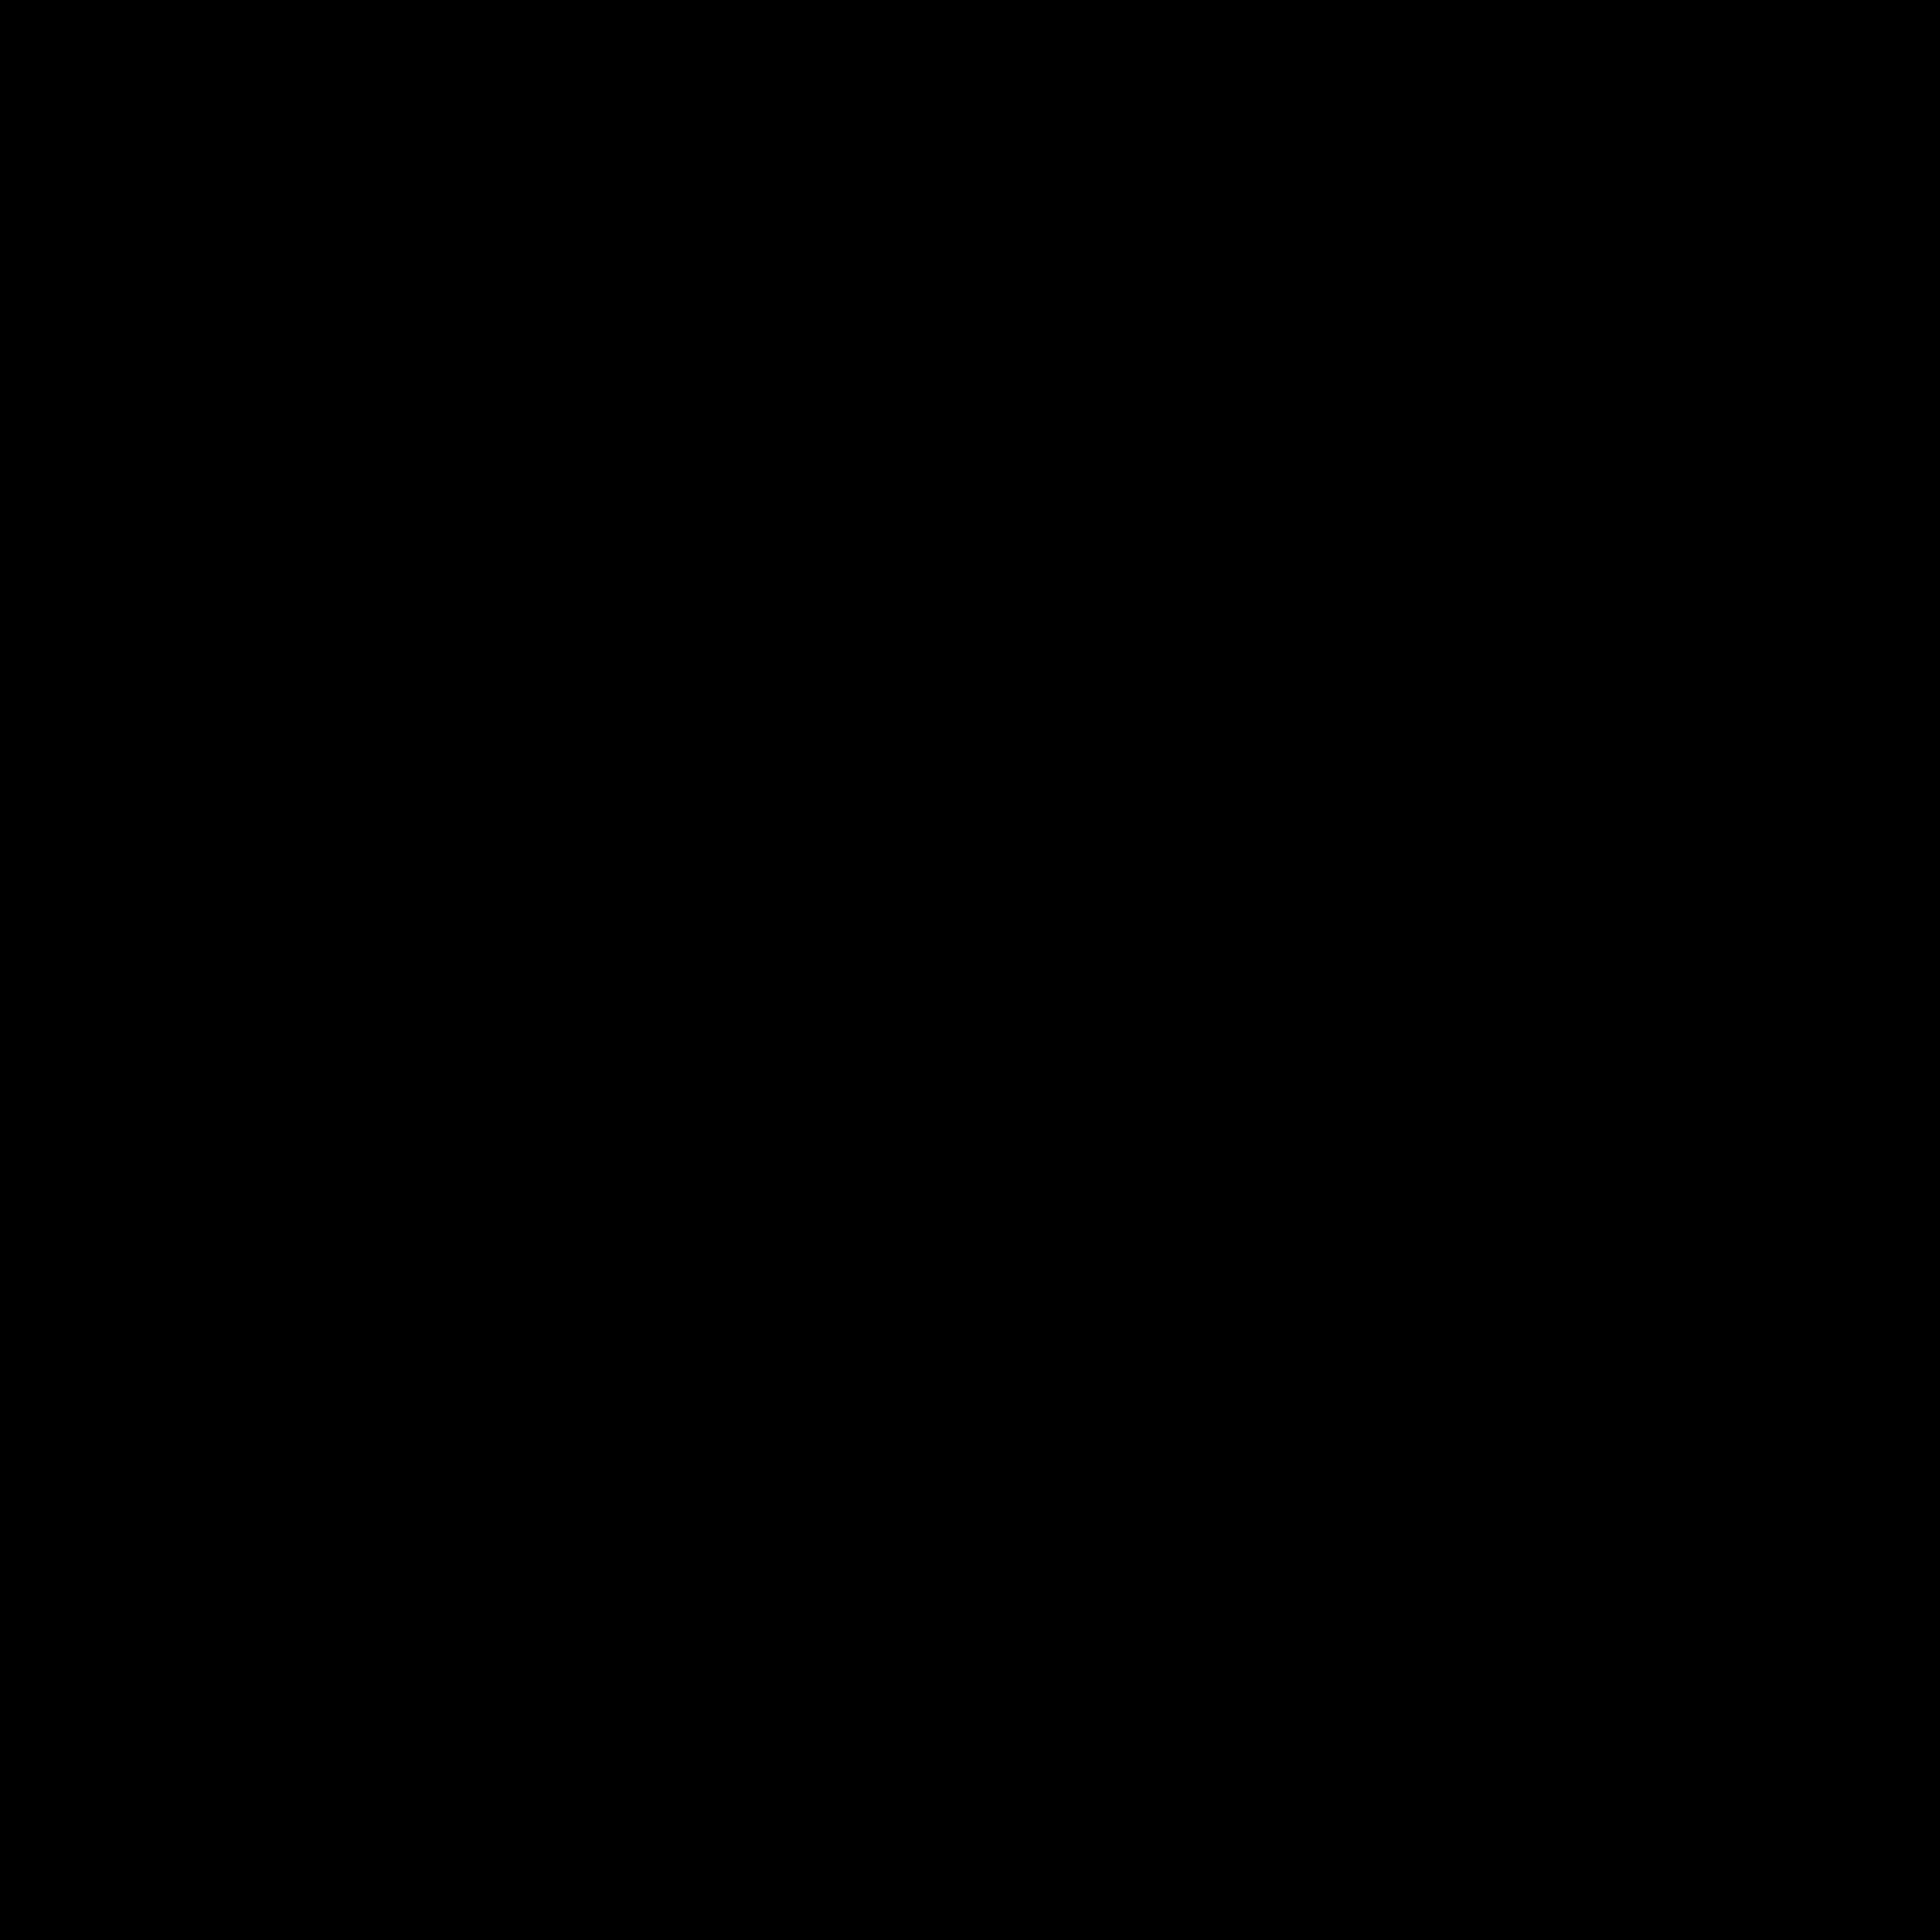 Swoosh Nike Golf Logo.